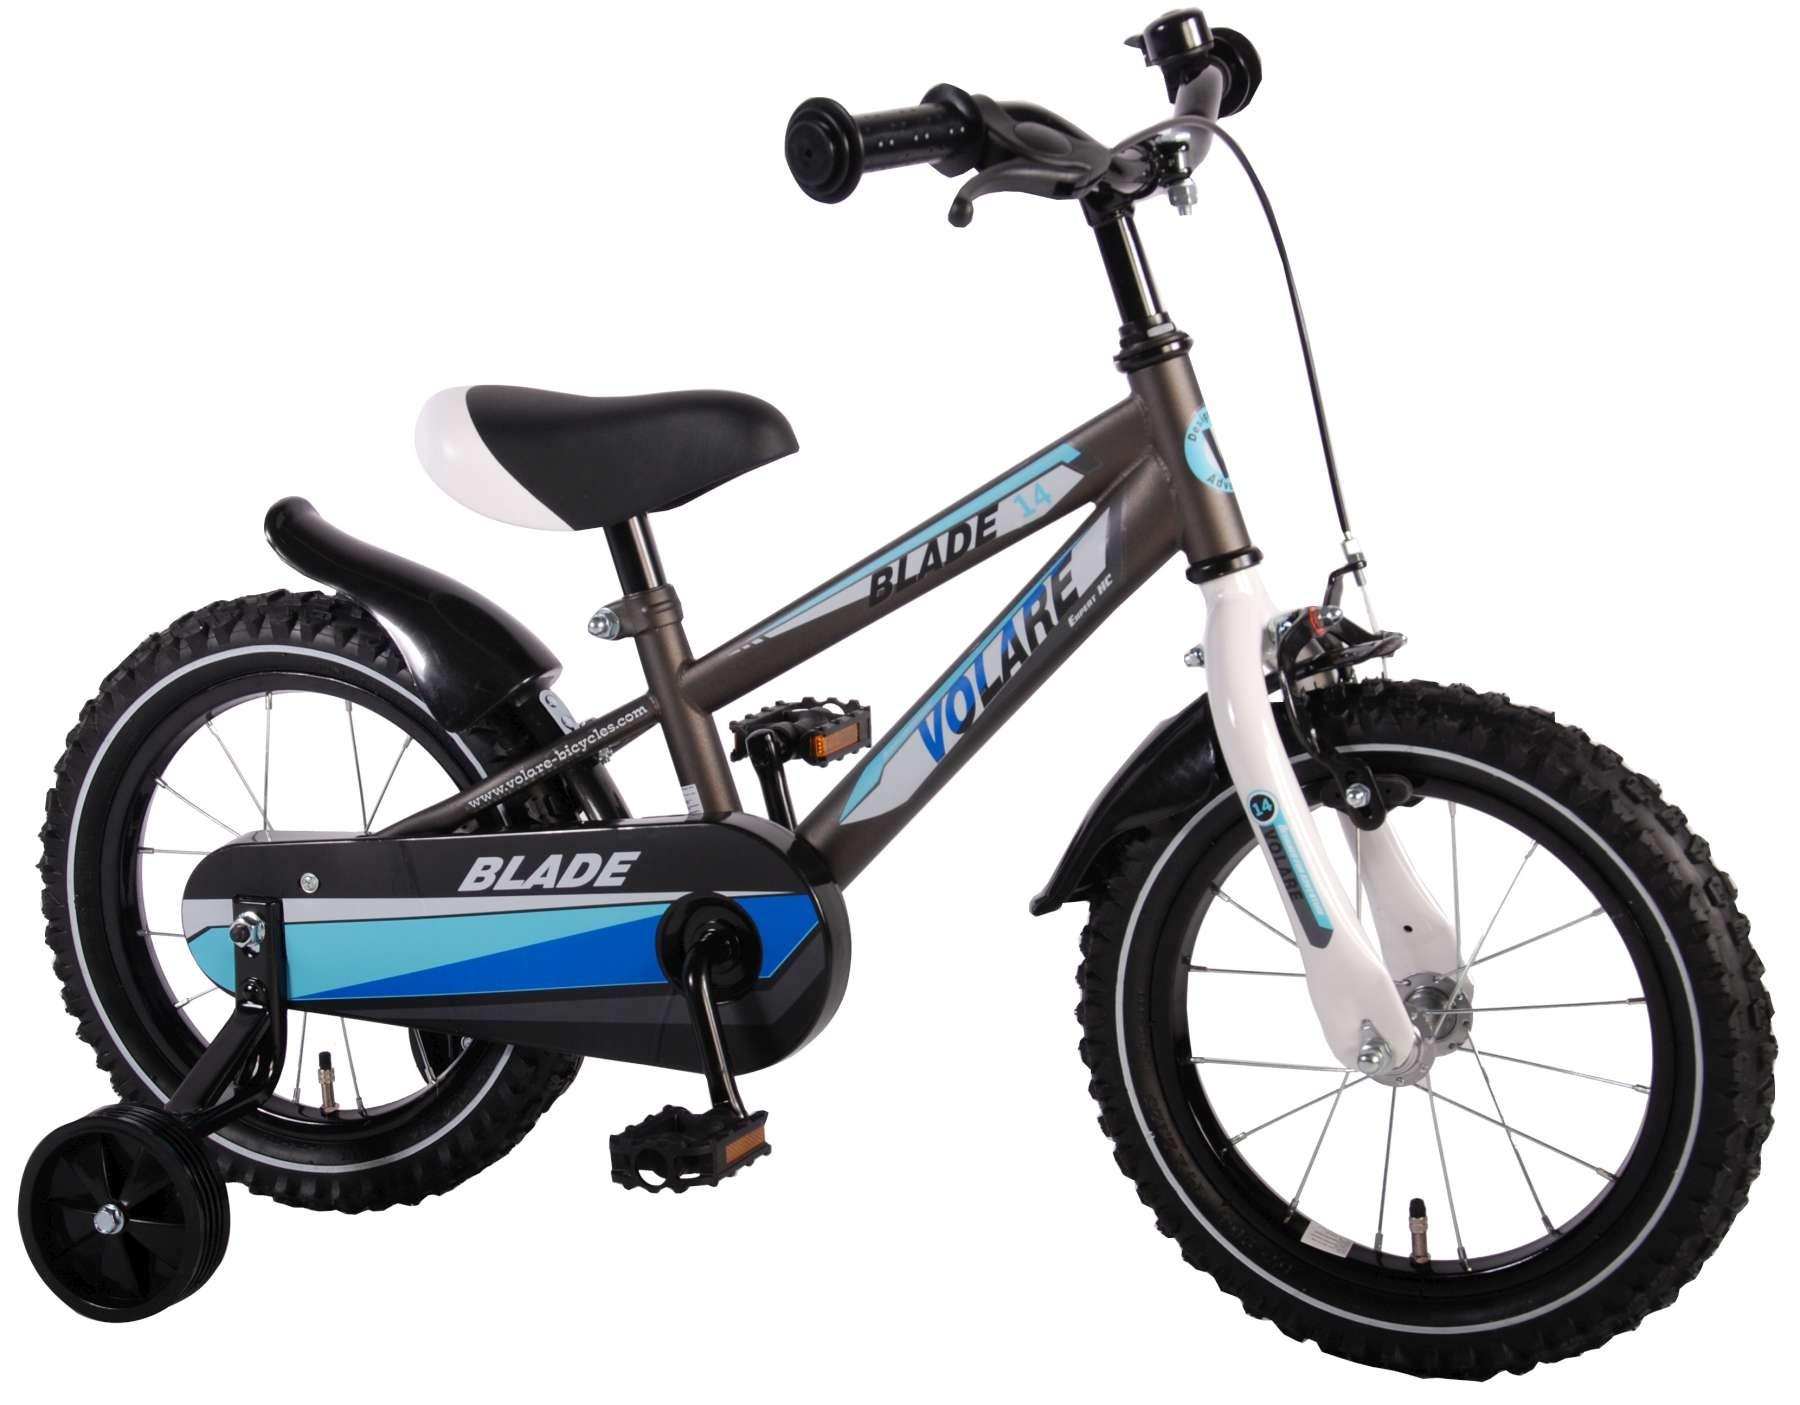 Volare Blade 14 Inch 23,5 cm Boys Coaster Brake Silver - Internet-Bikes